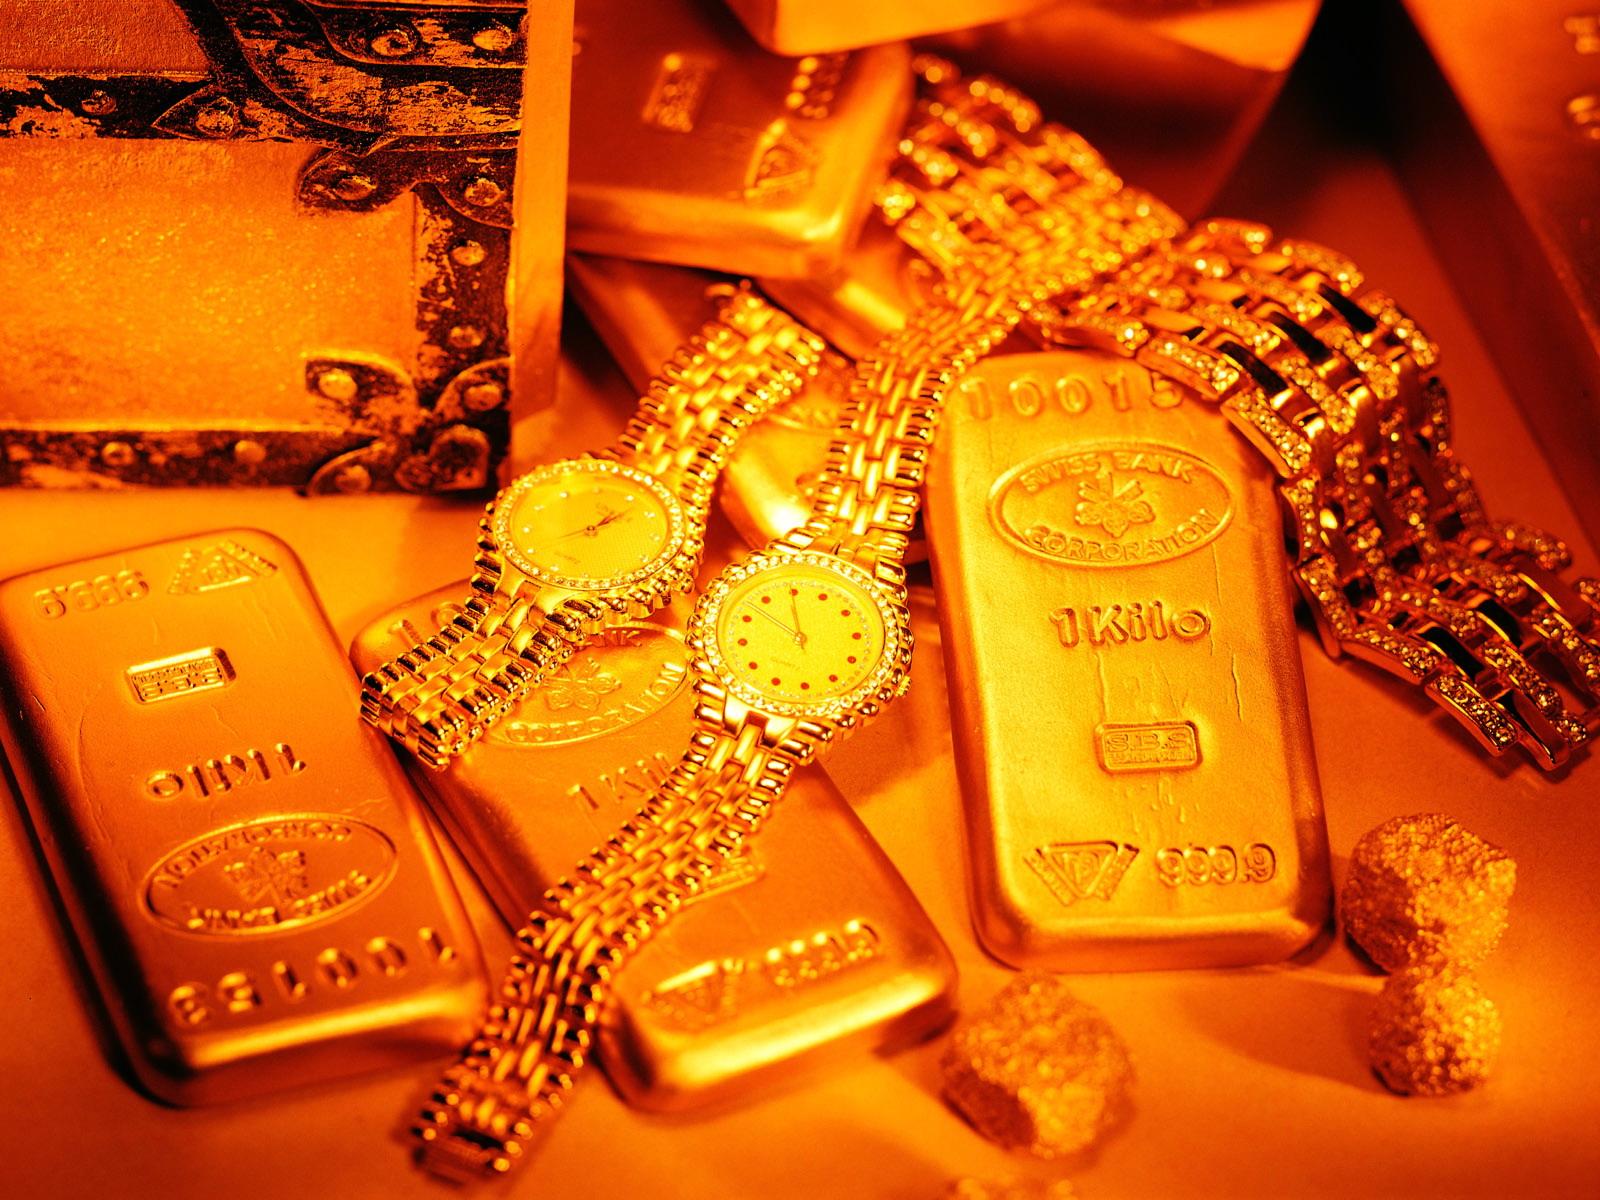 Zastaki.com - Золото бриллианты